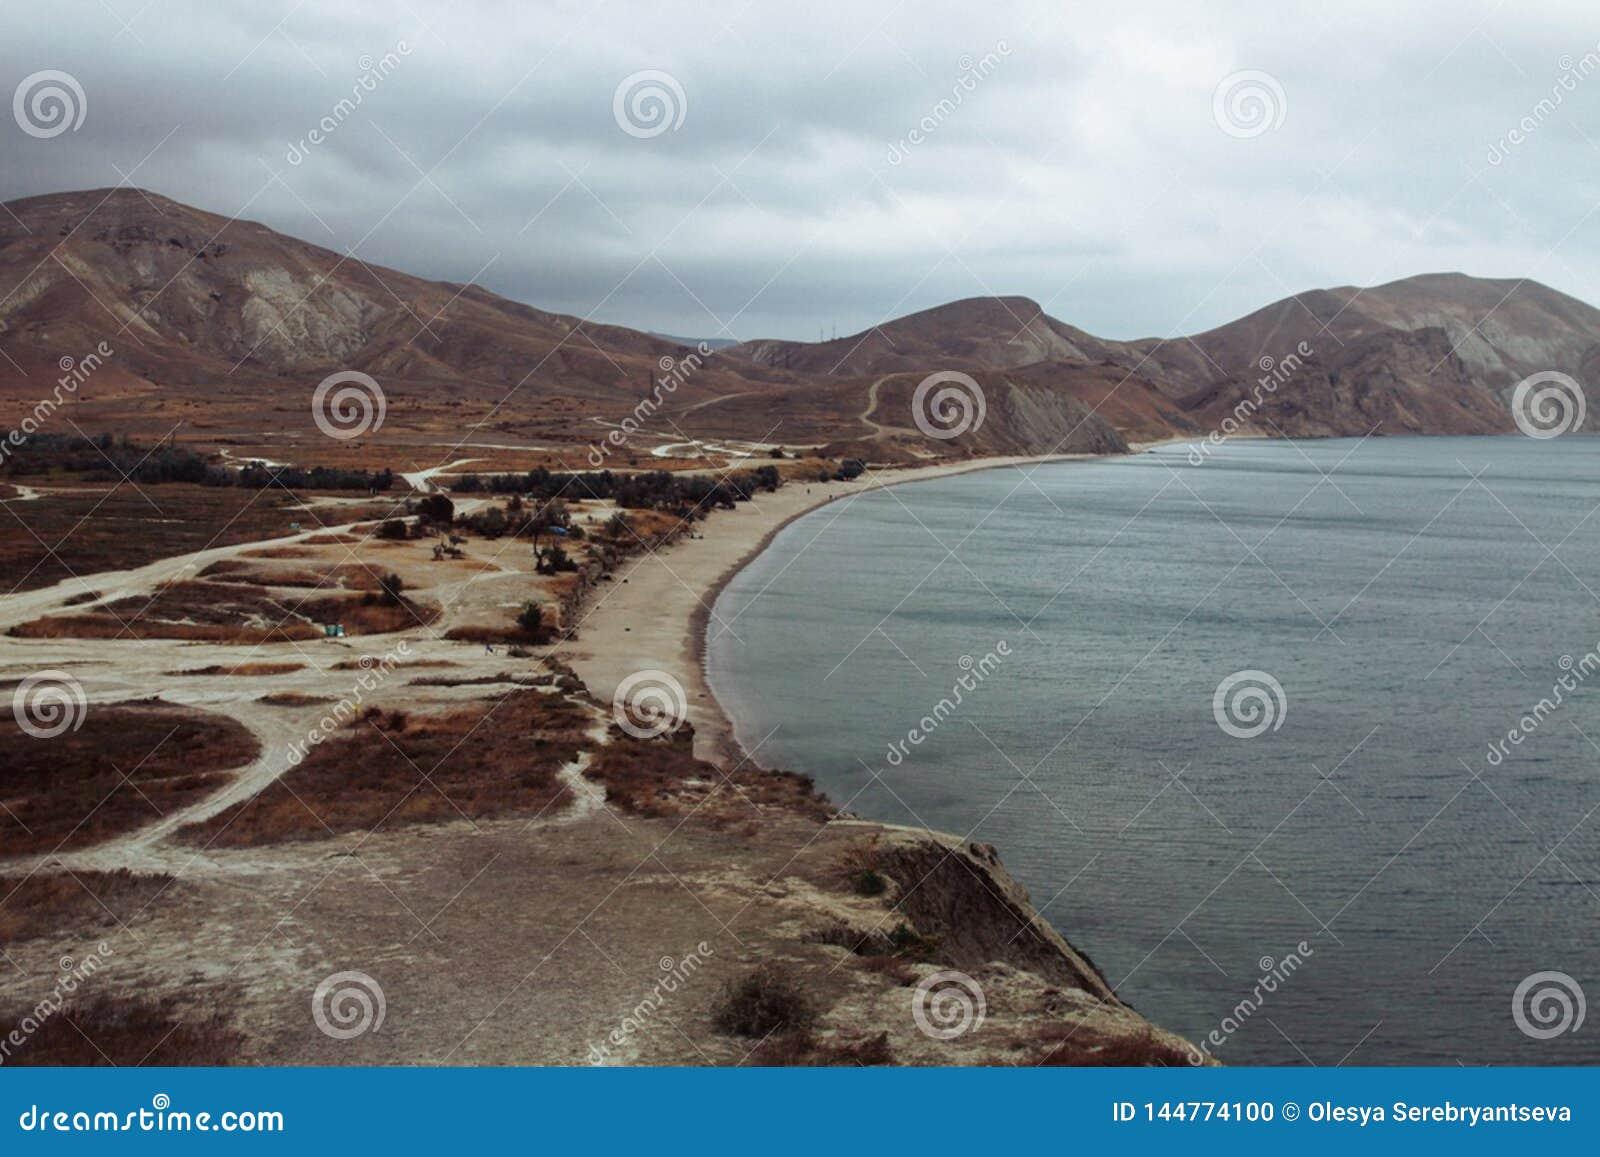 Landscape of seaside shore, Kara-Dag mountains in south winter day. Black Sea, Koktebel, Crimea